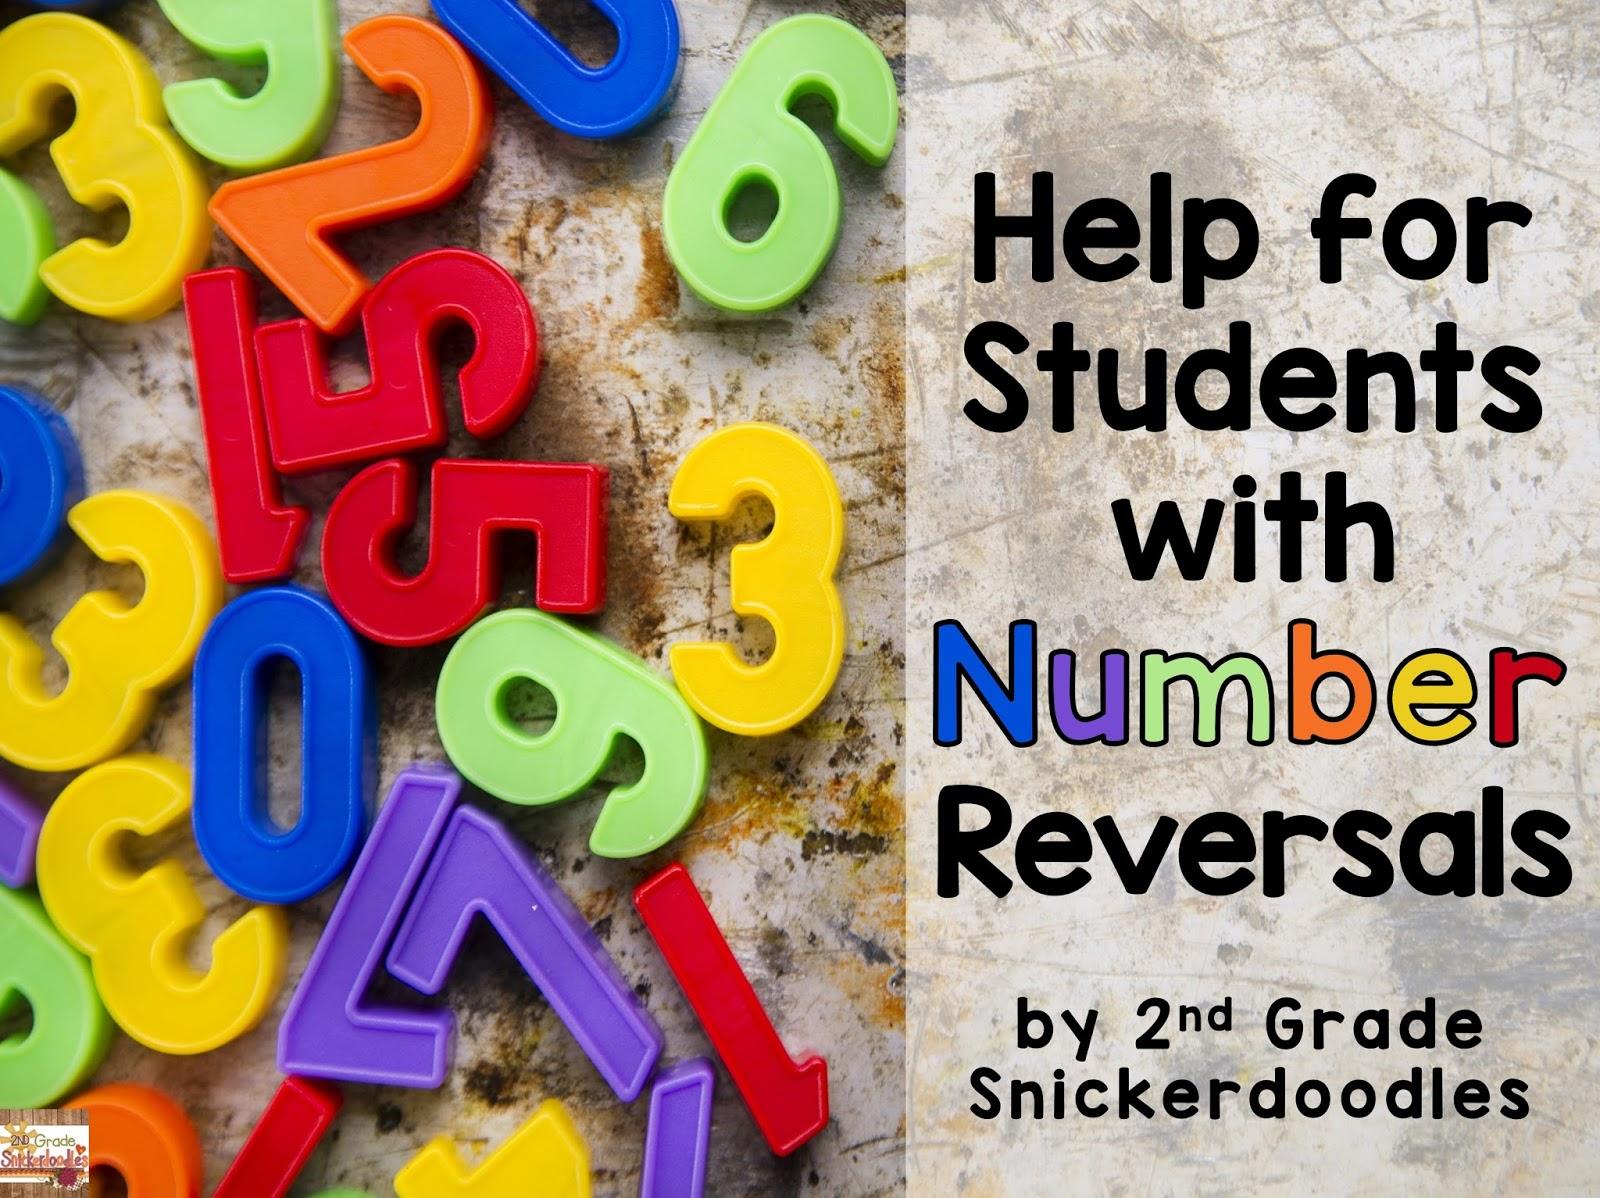 2nd Grade Snickerdoodles Number Reversals